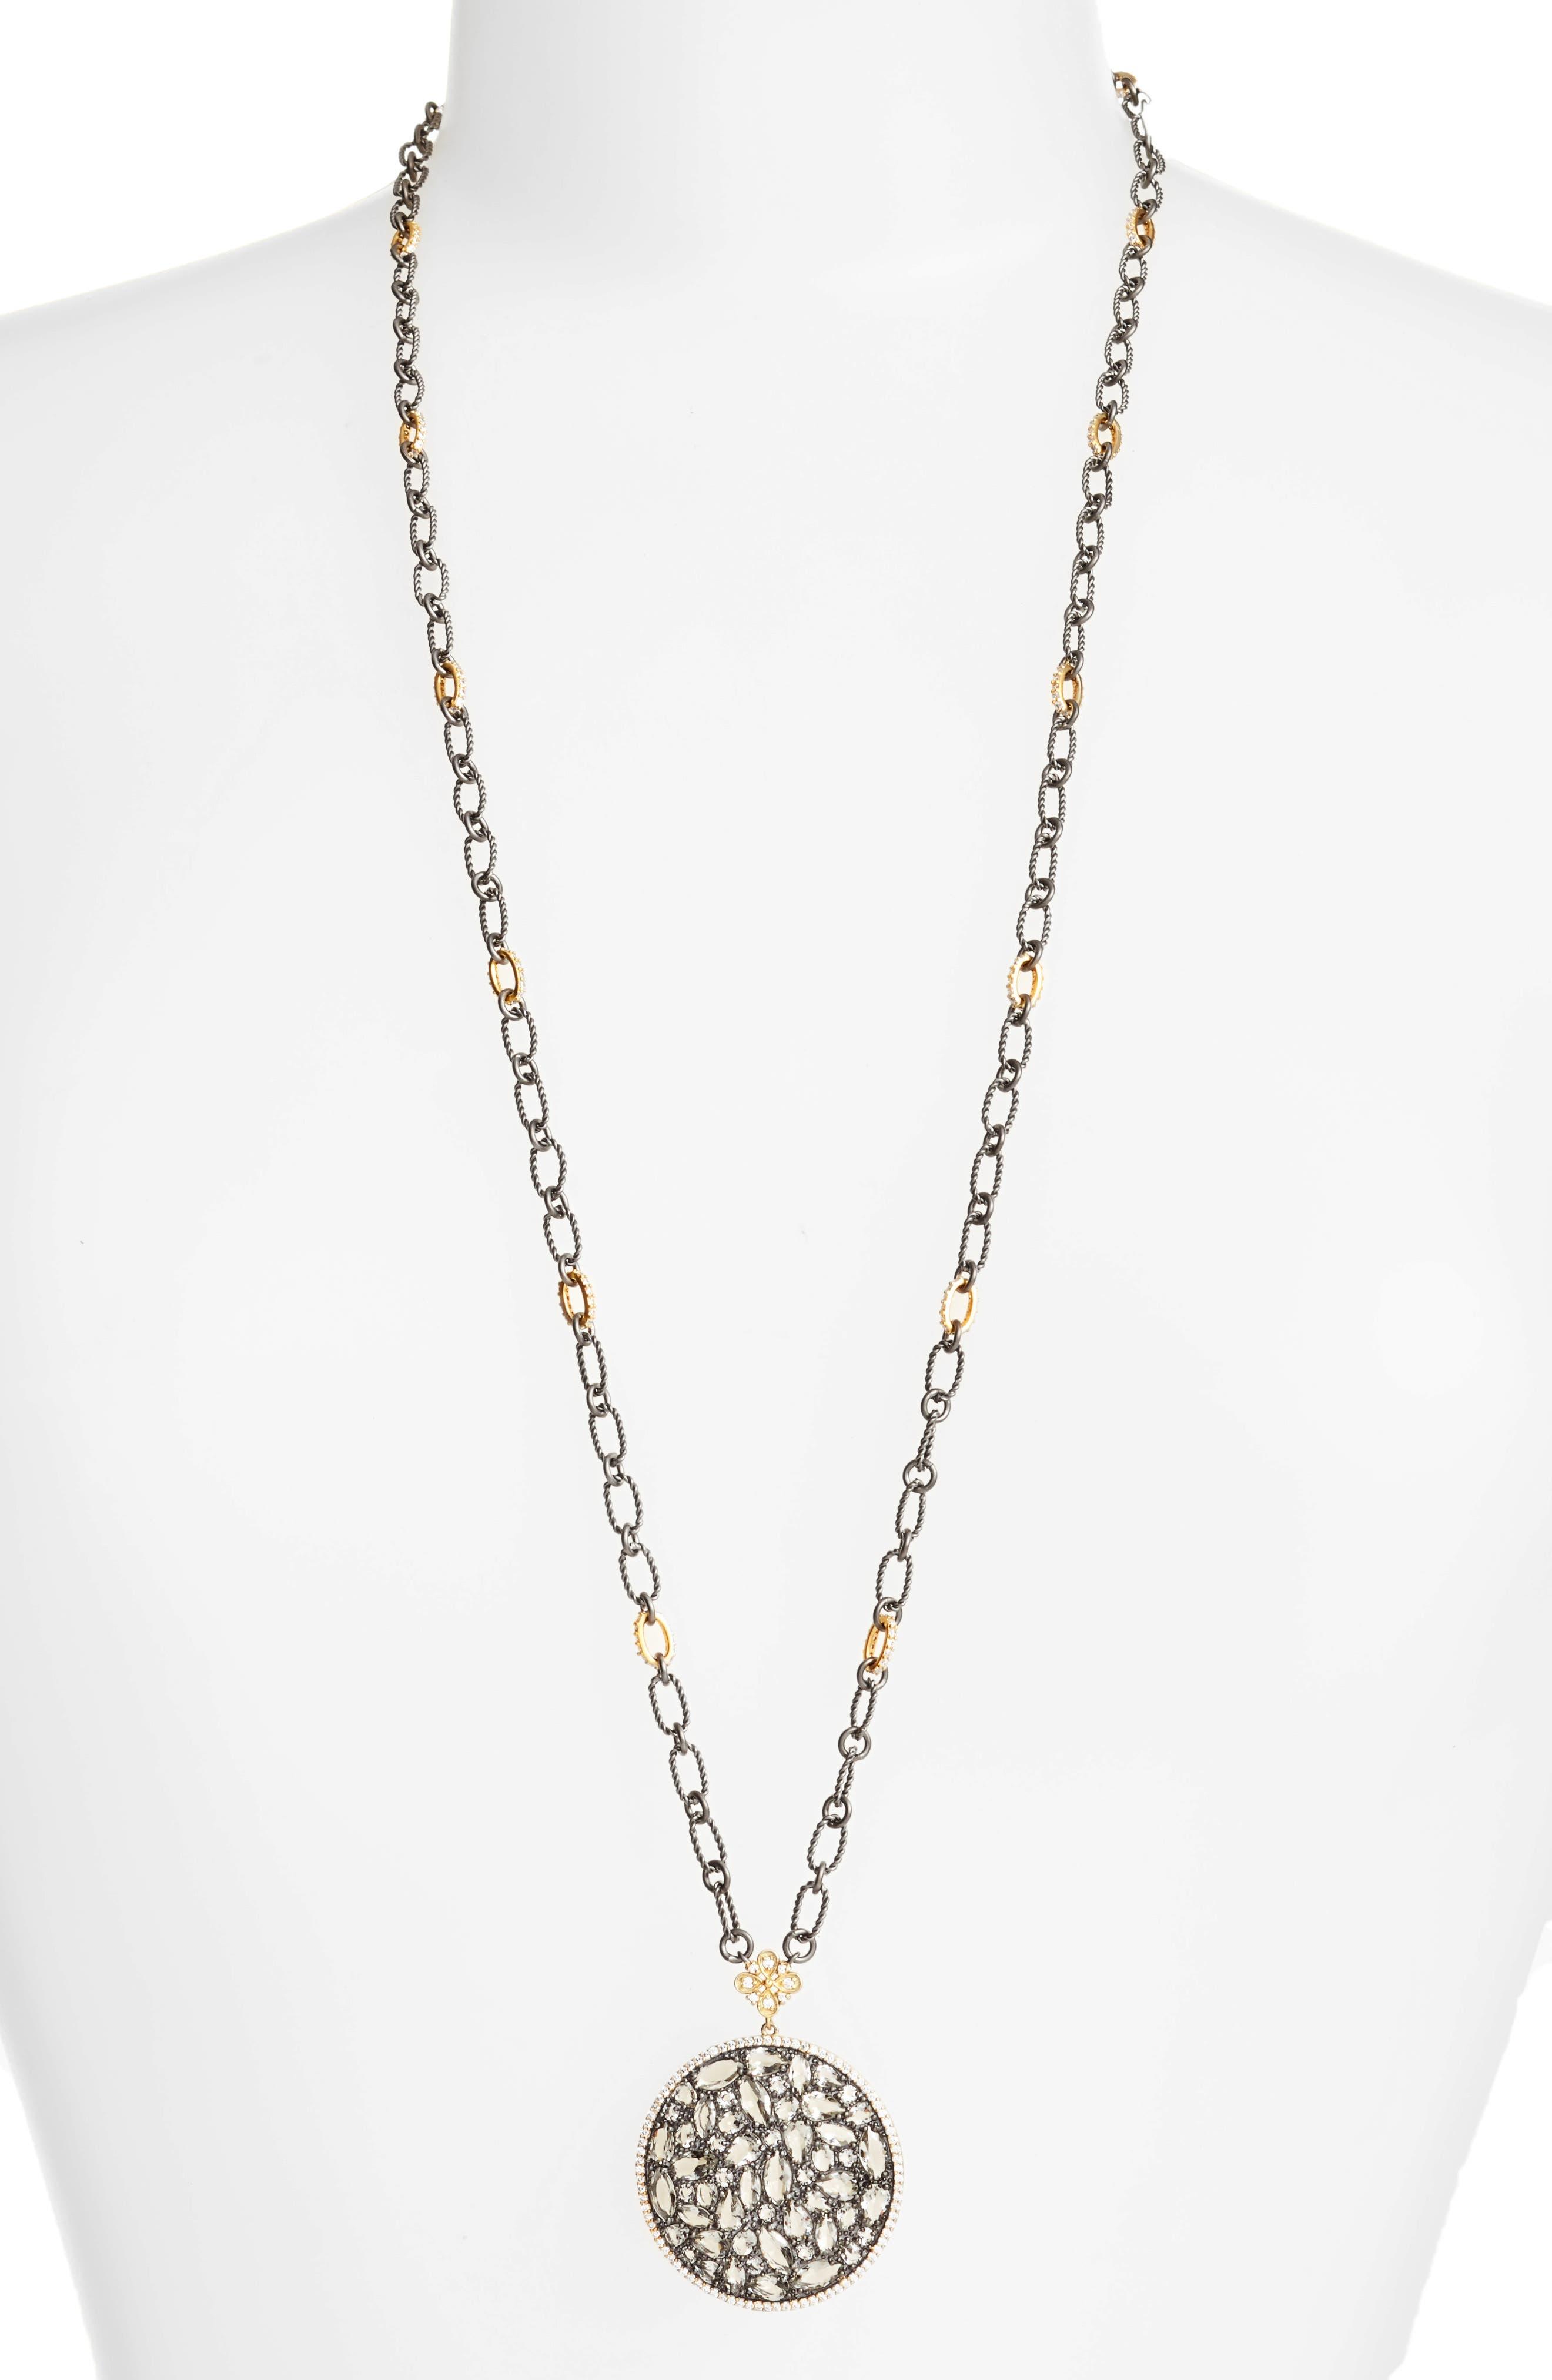 Pebble Pendant Necklace,                         Main,                         color, Gold/ Black Rhodium